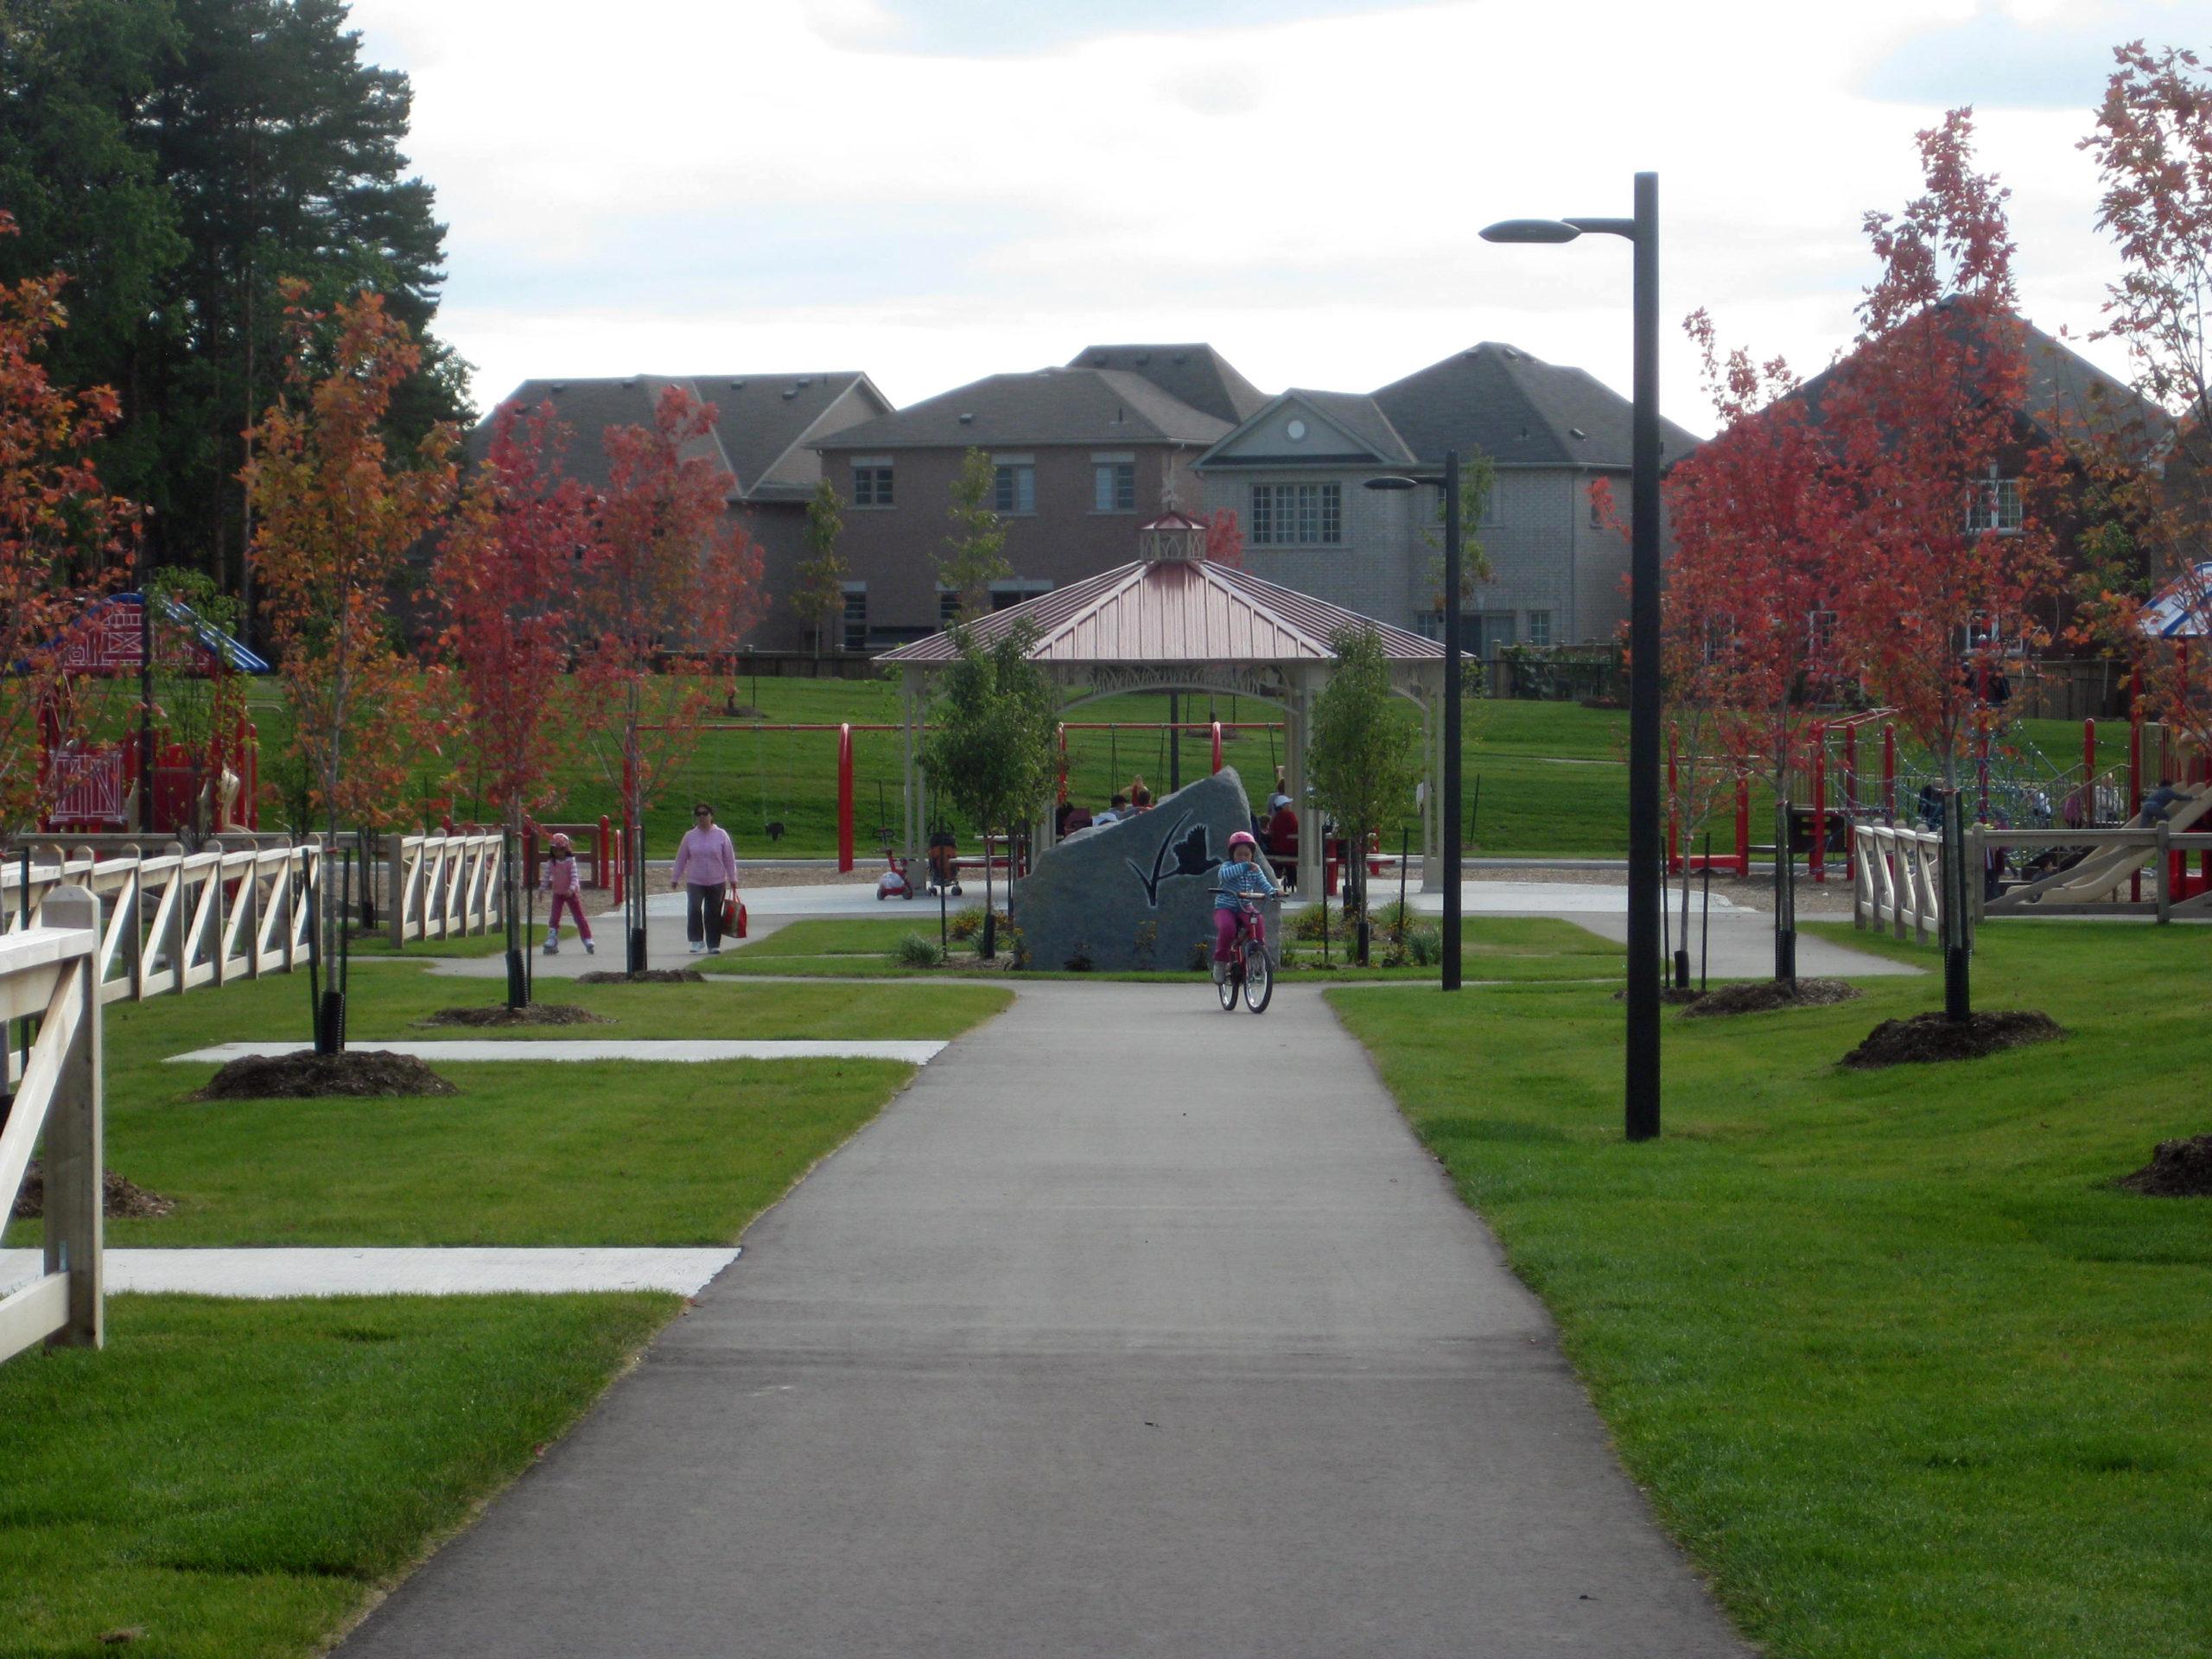 Pathway to the playground.